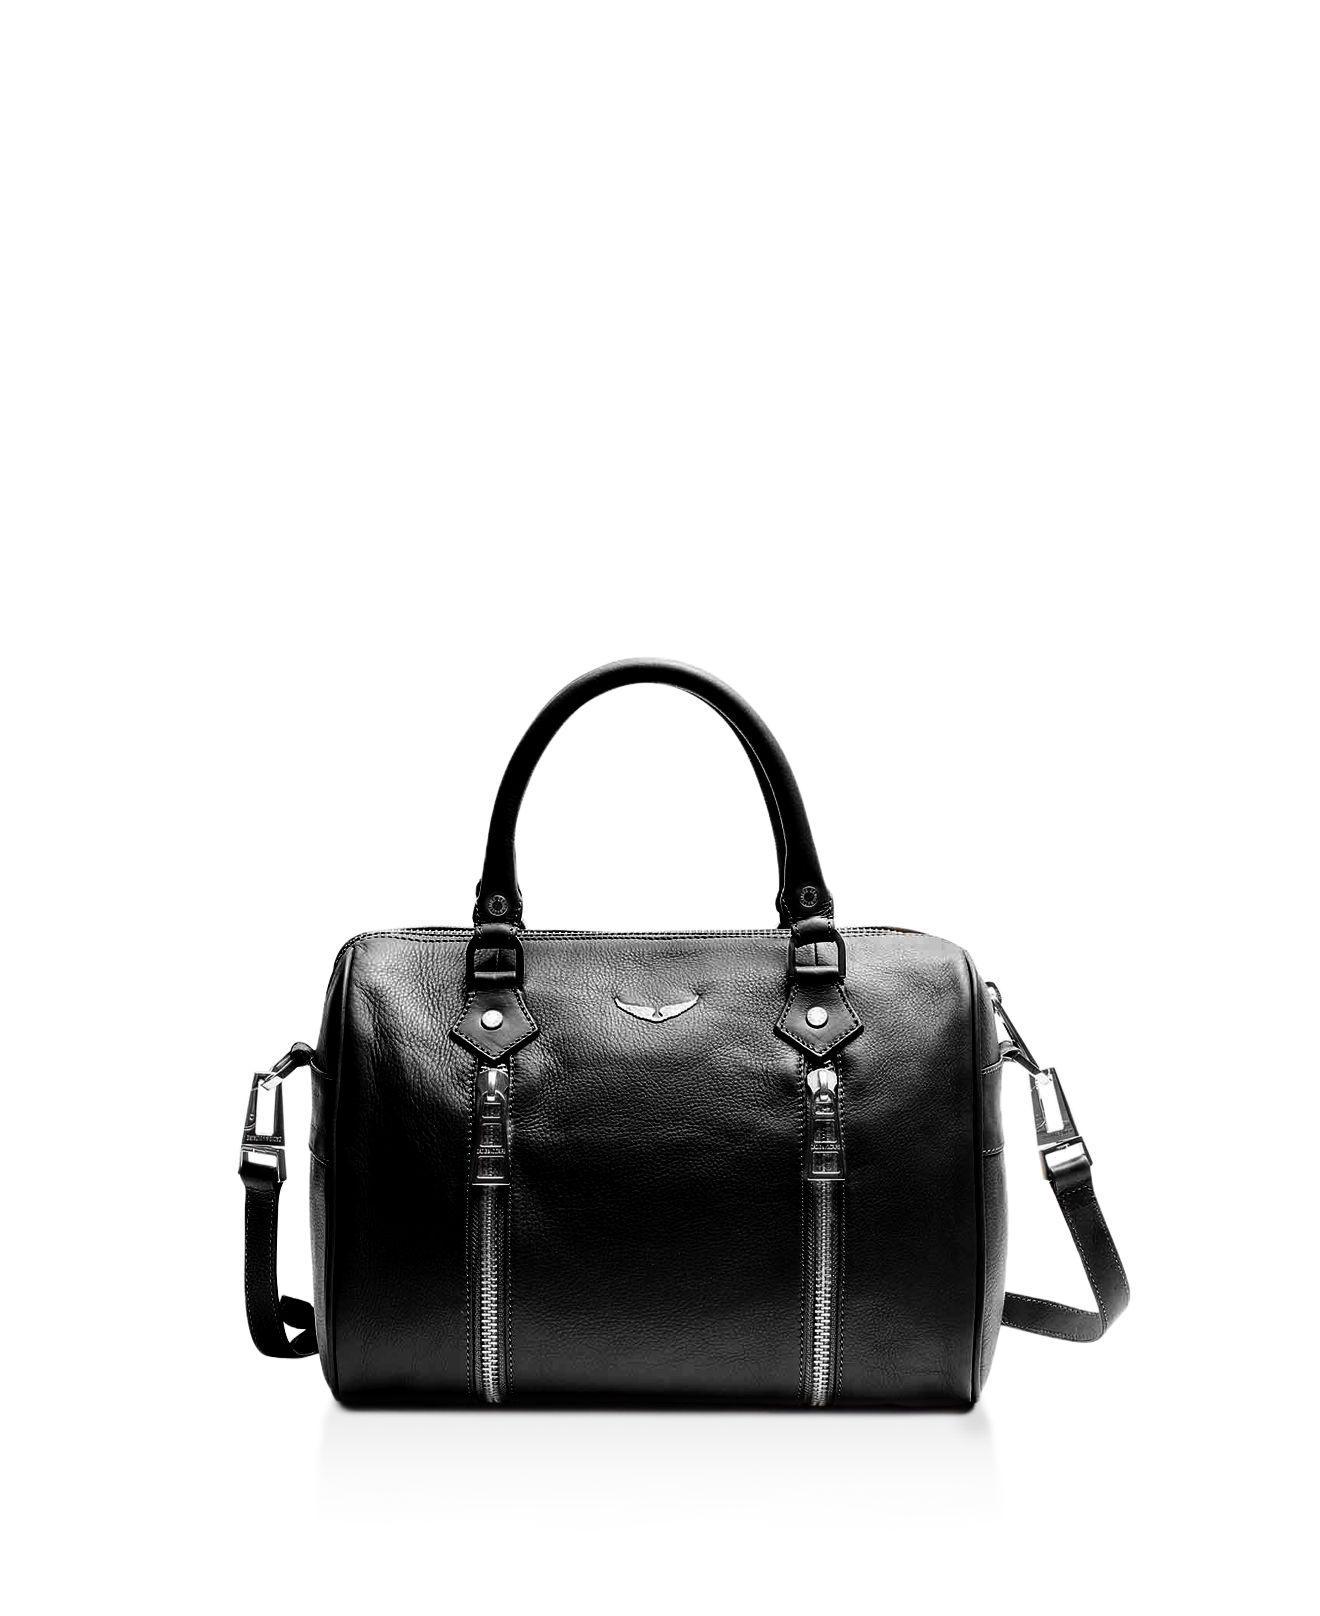 Zadig & Voltaire Pre-owned - Black Leather Handbag Sunny JJvxxCDx